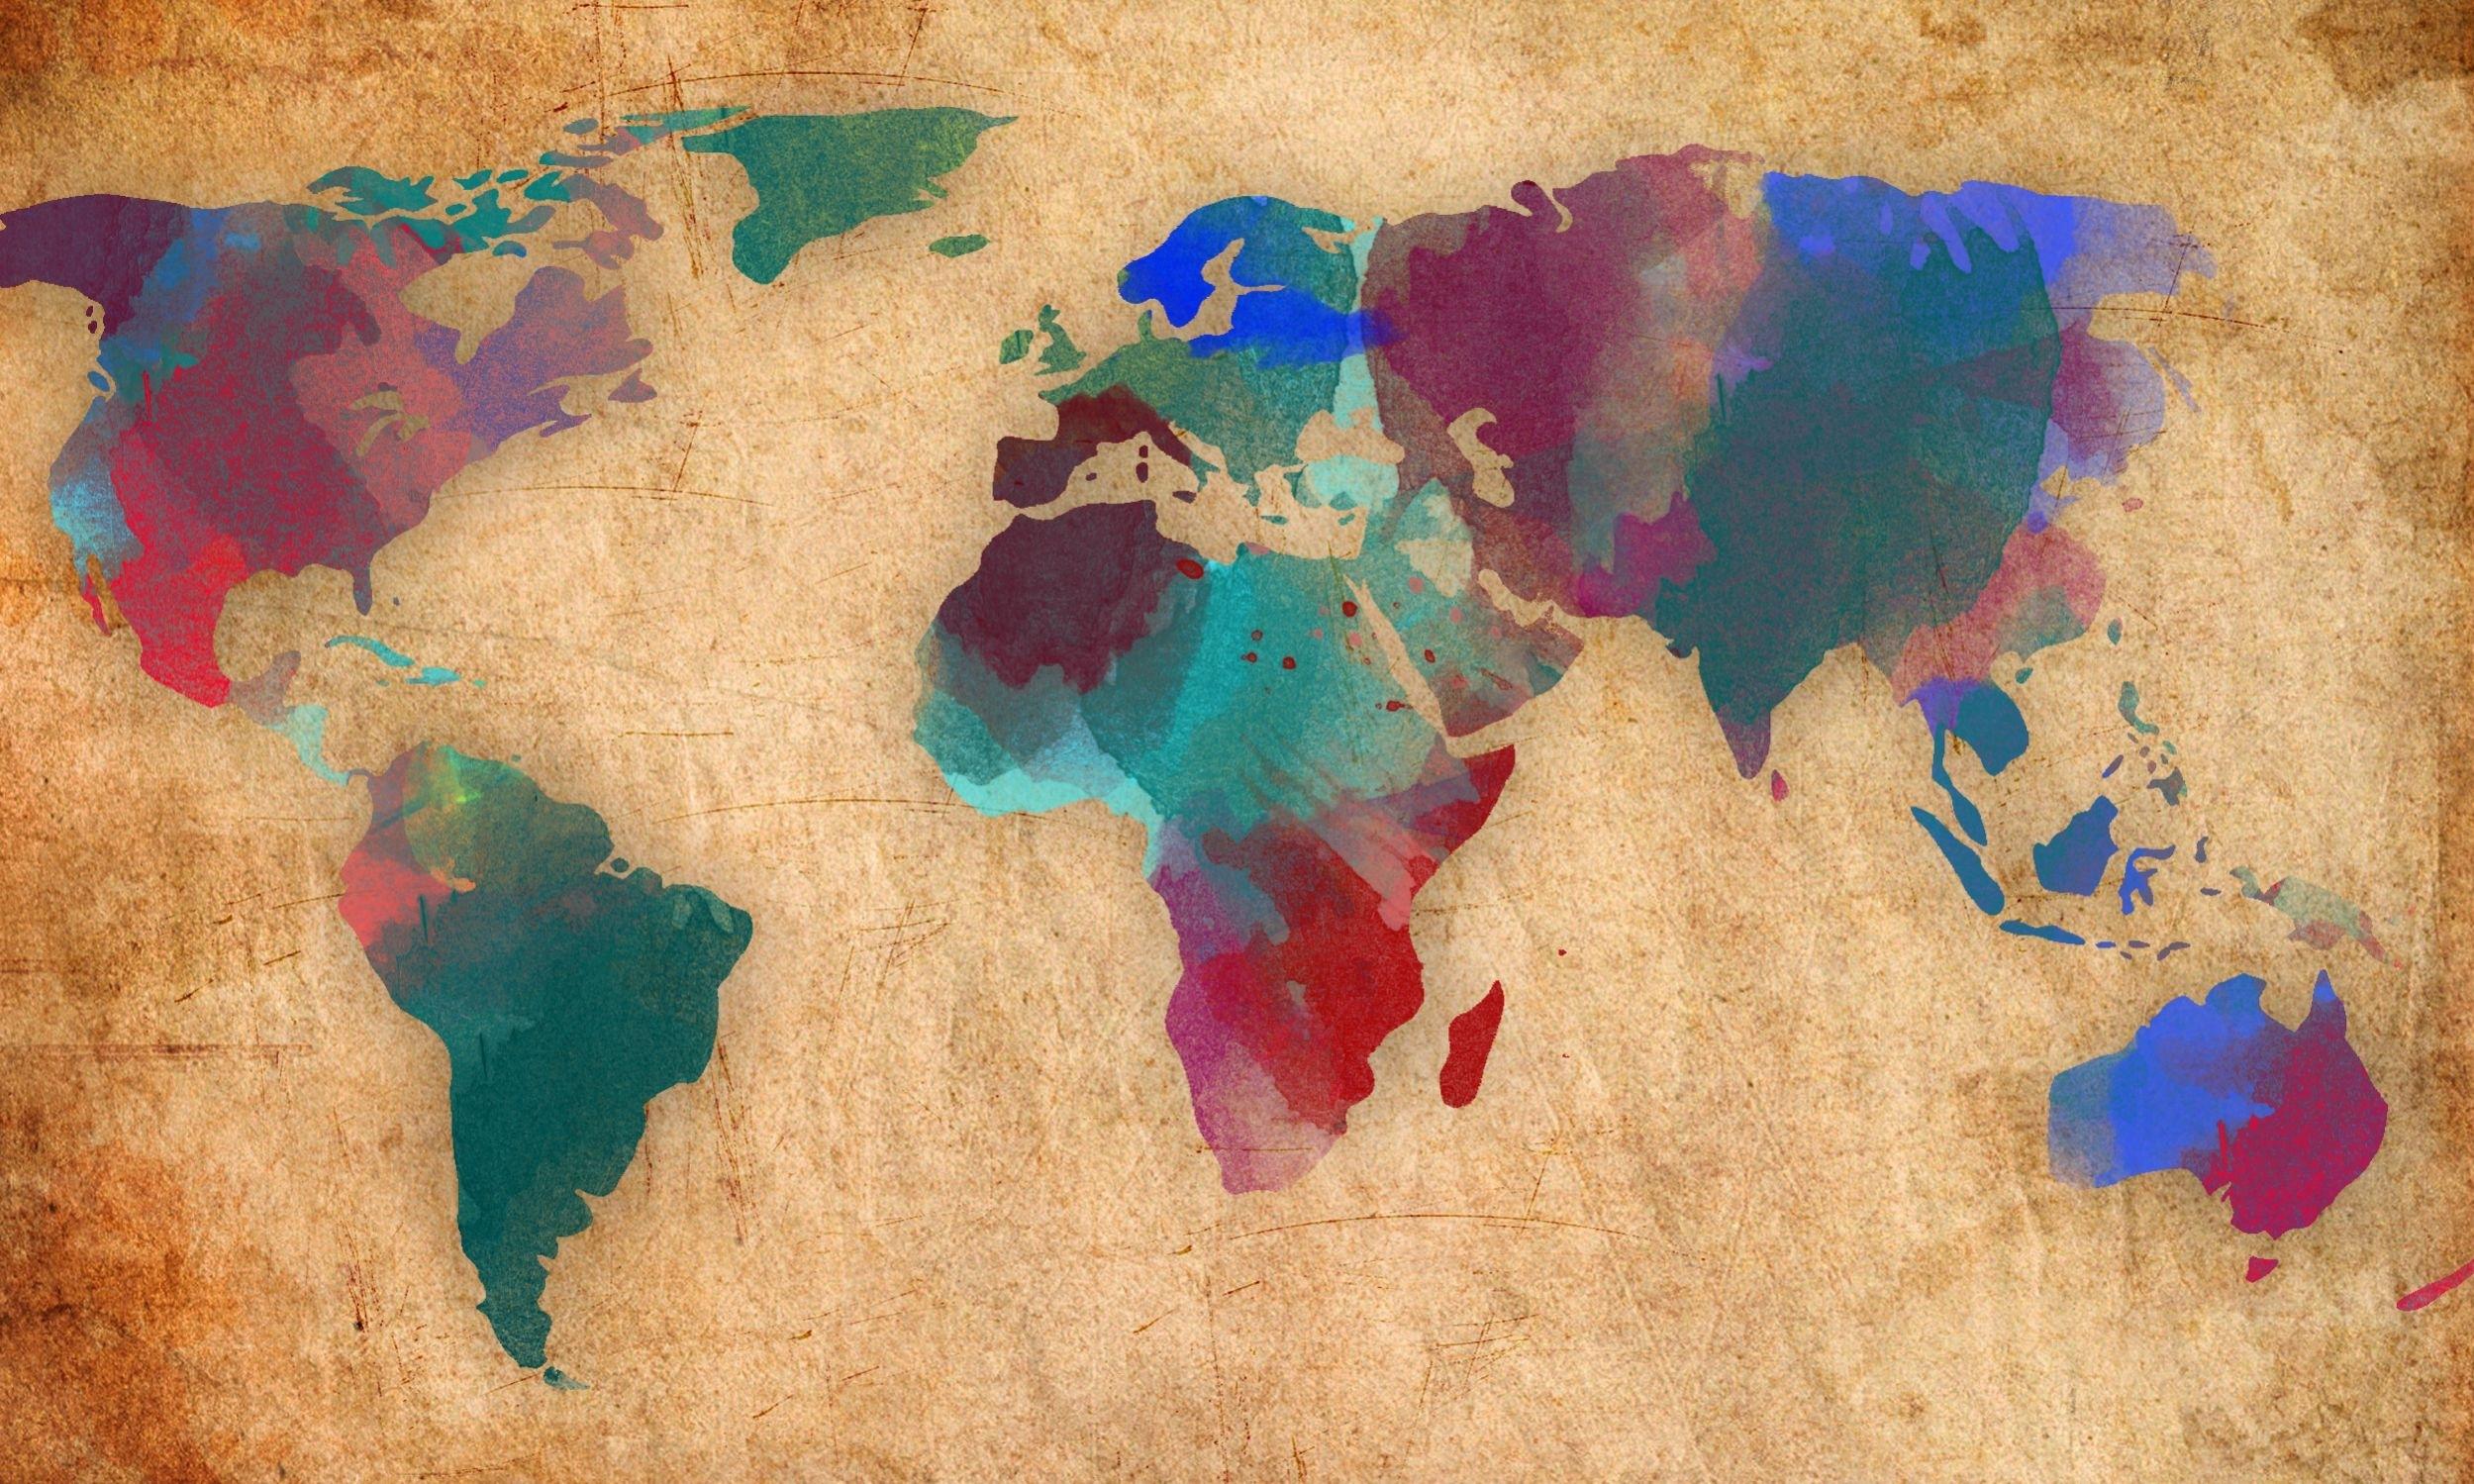 10 Best World Map Laptop Wallpaper Full Hd 1920 1080 For Pc